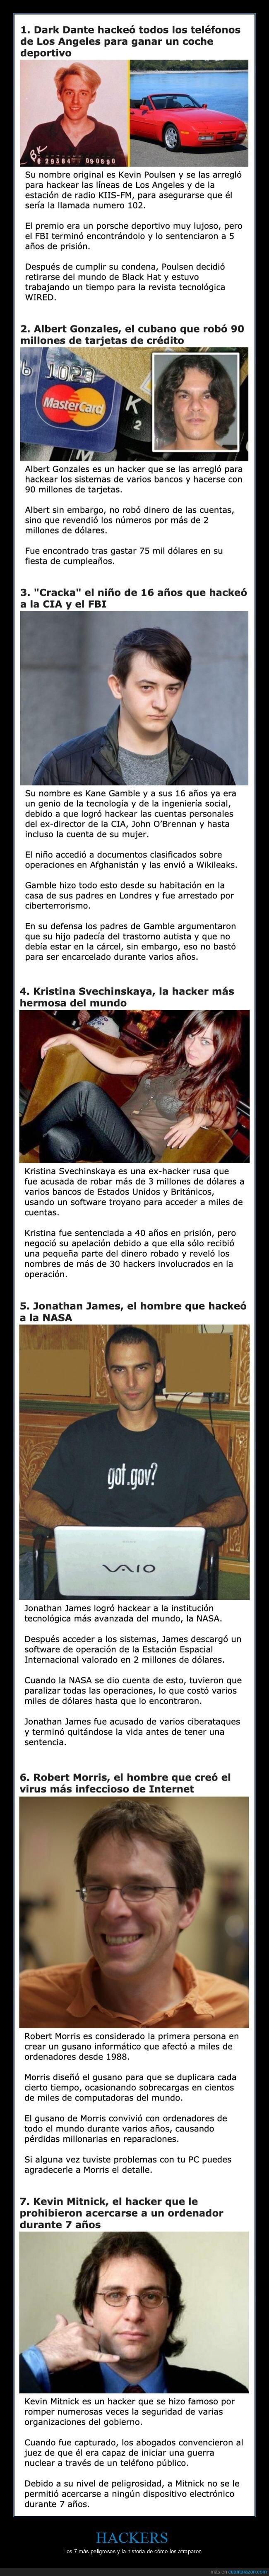 hackers,peligrosos